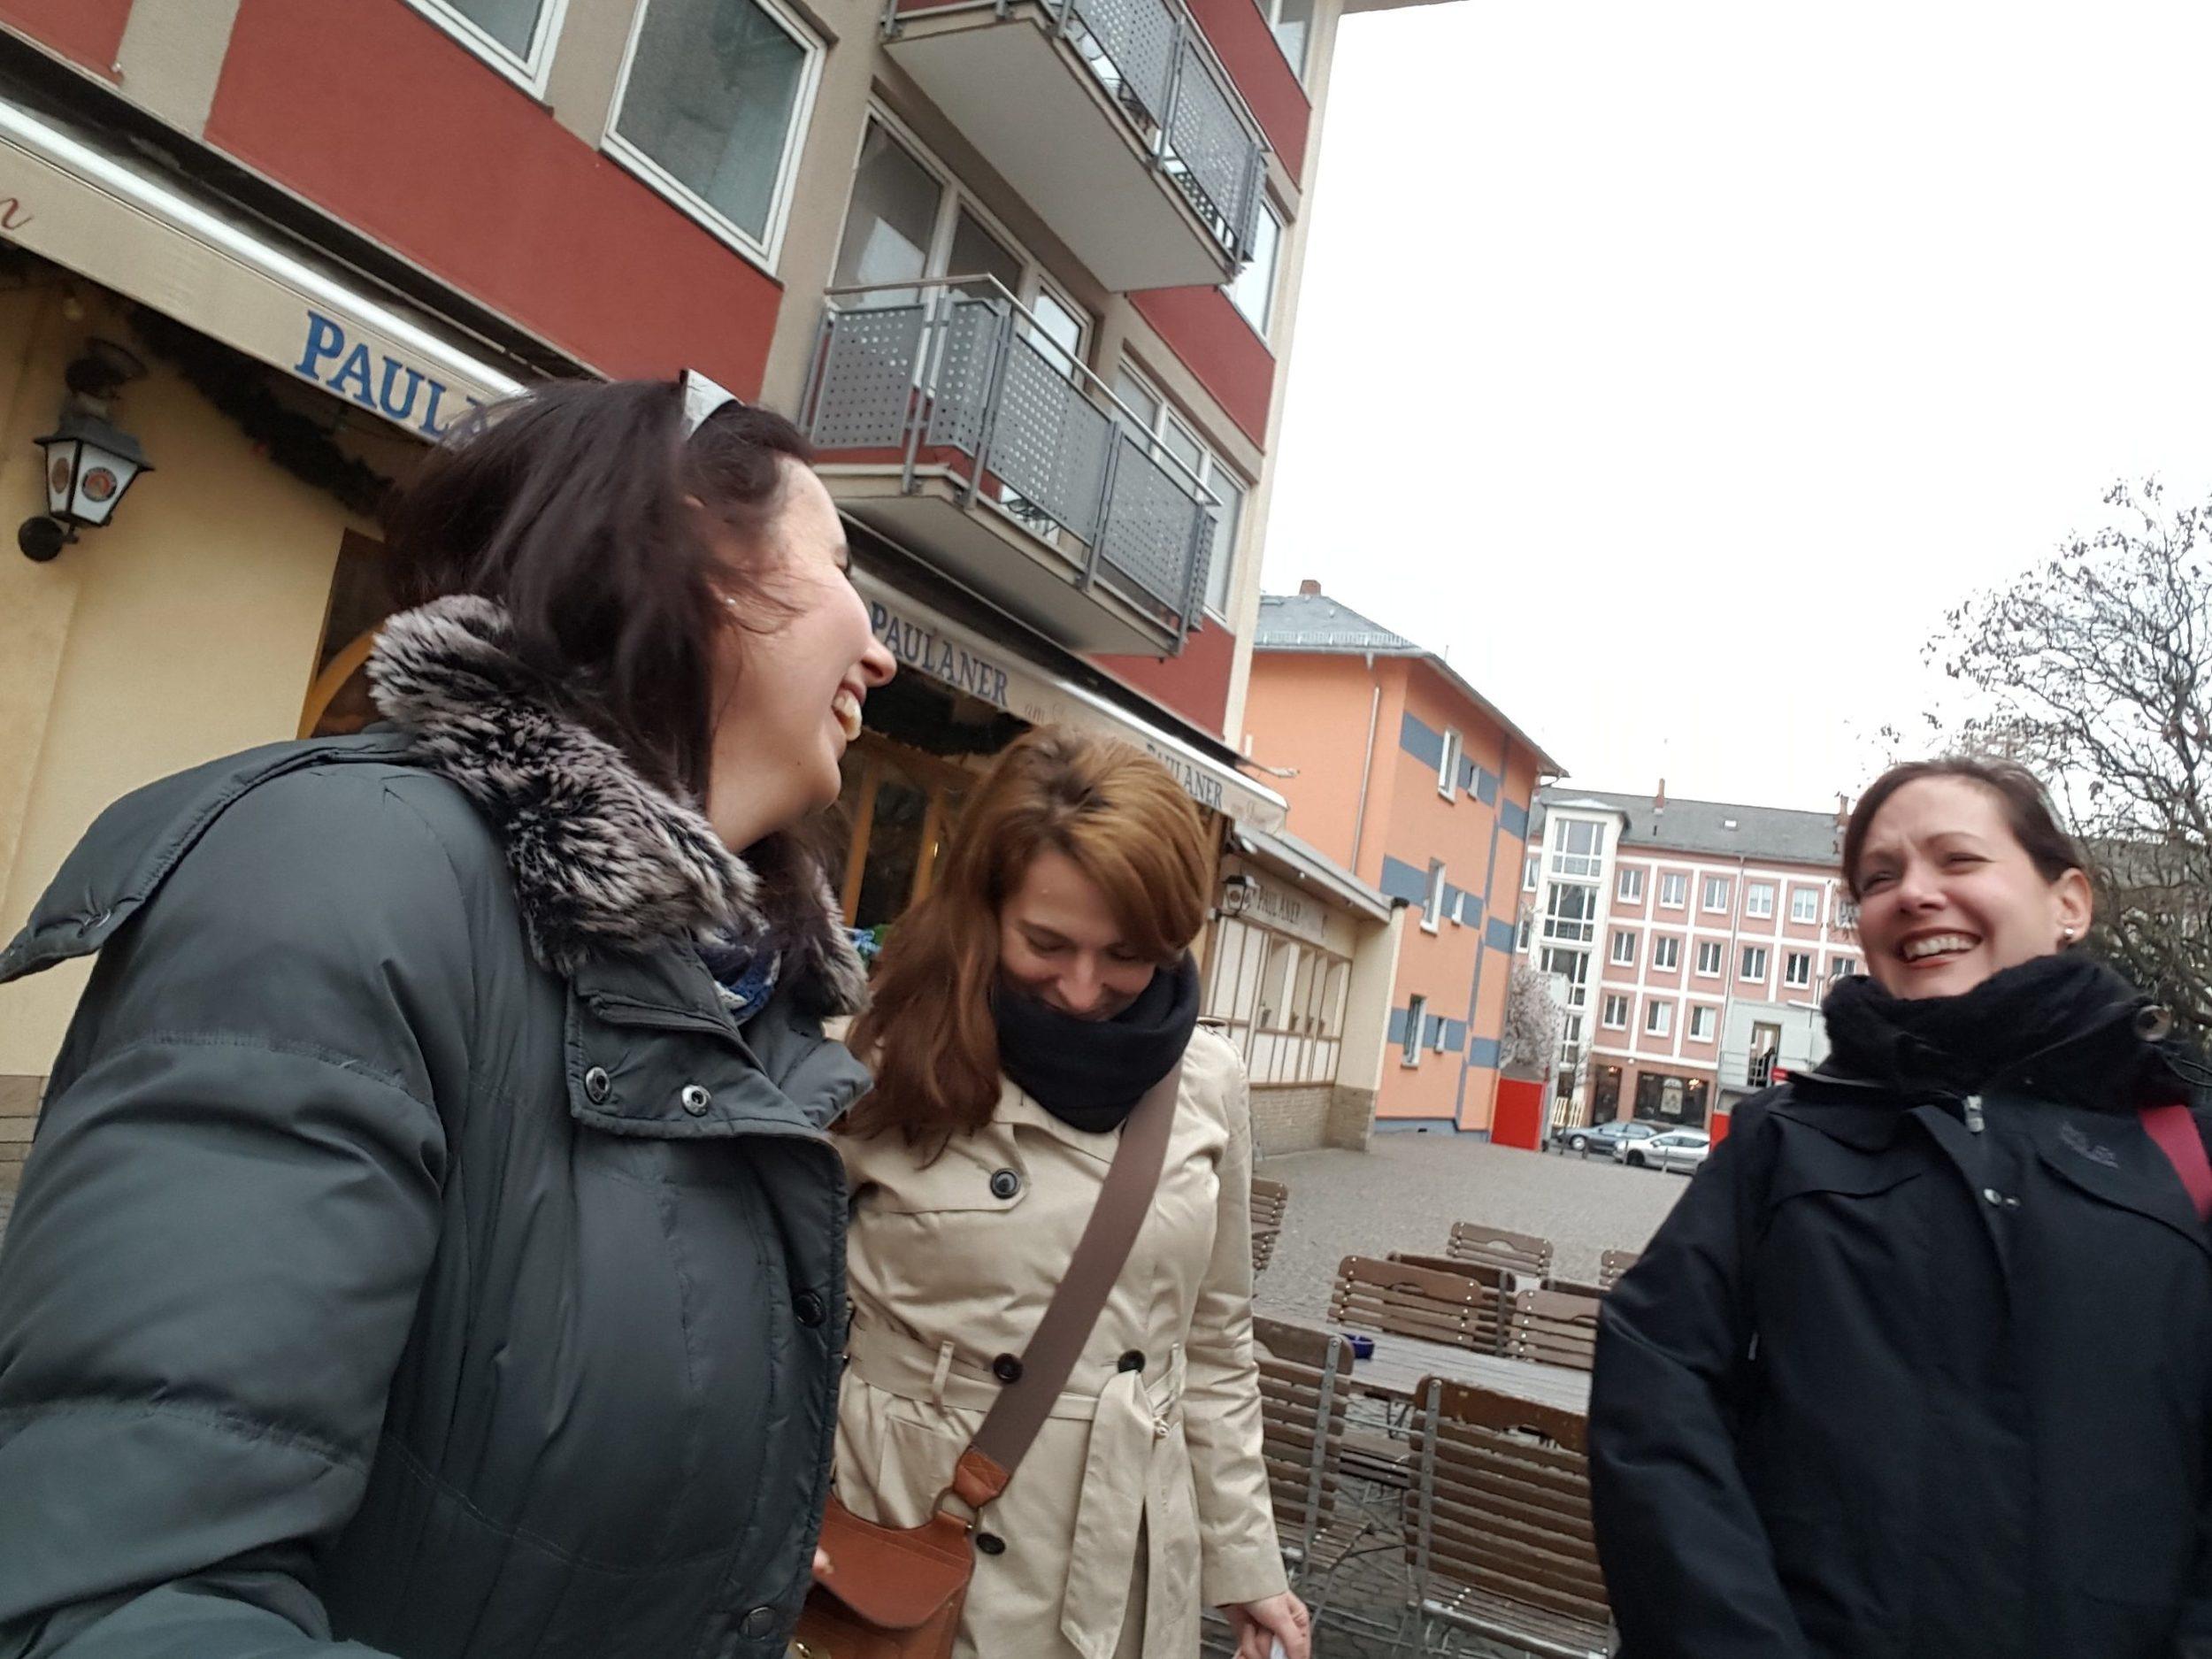 Friends, Frankfurt, Germany, April big things, expat living